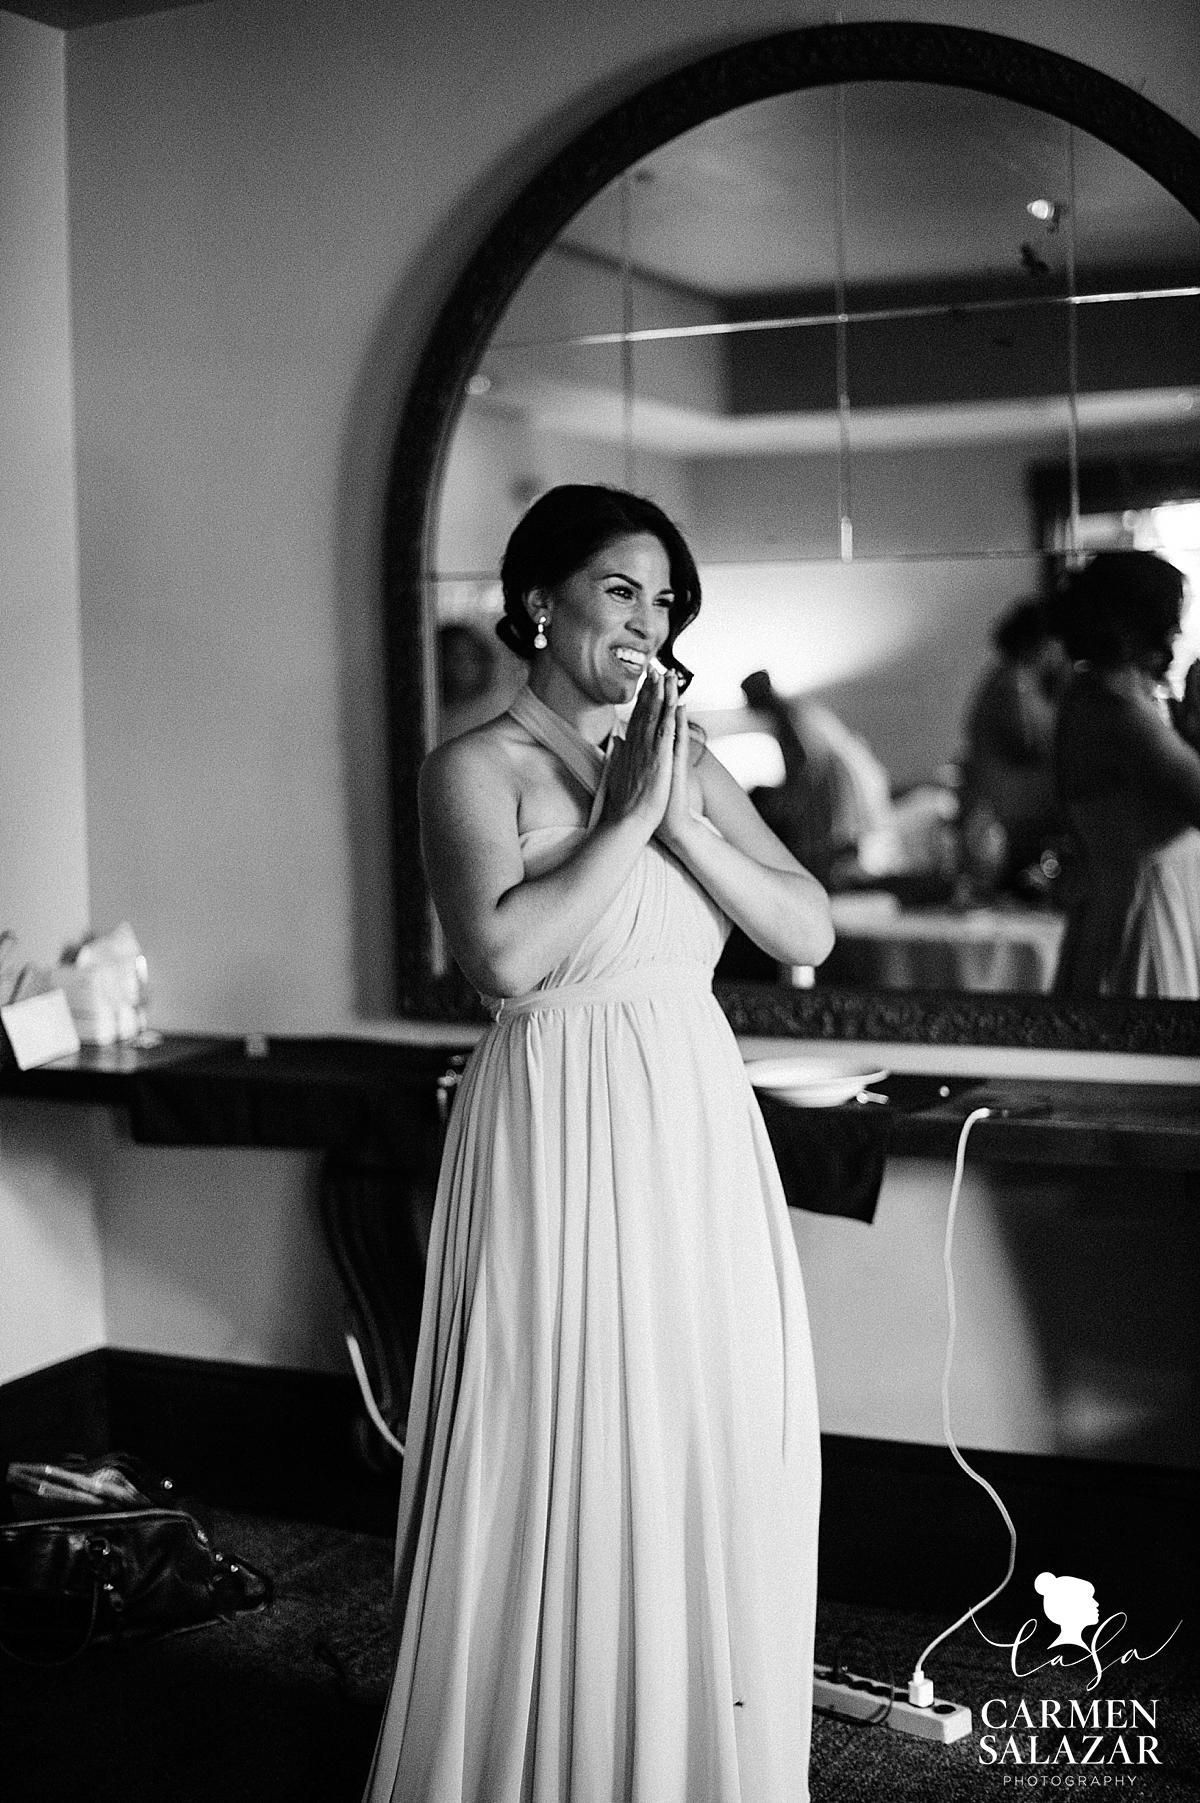 Emotional bridesmaid at Wine and Roses wedding - Carmen Salazar